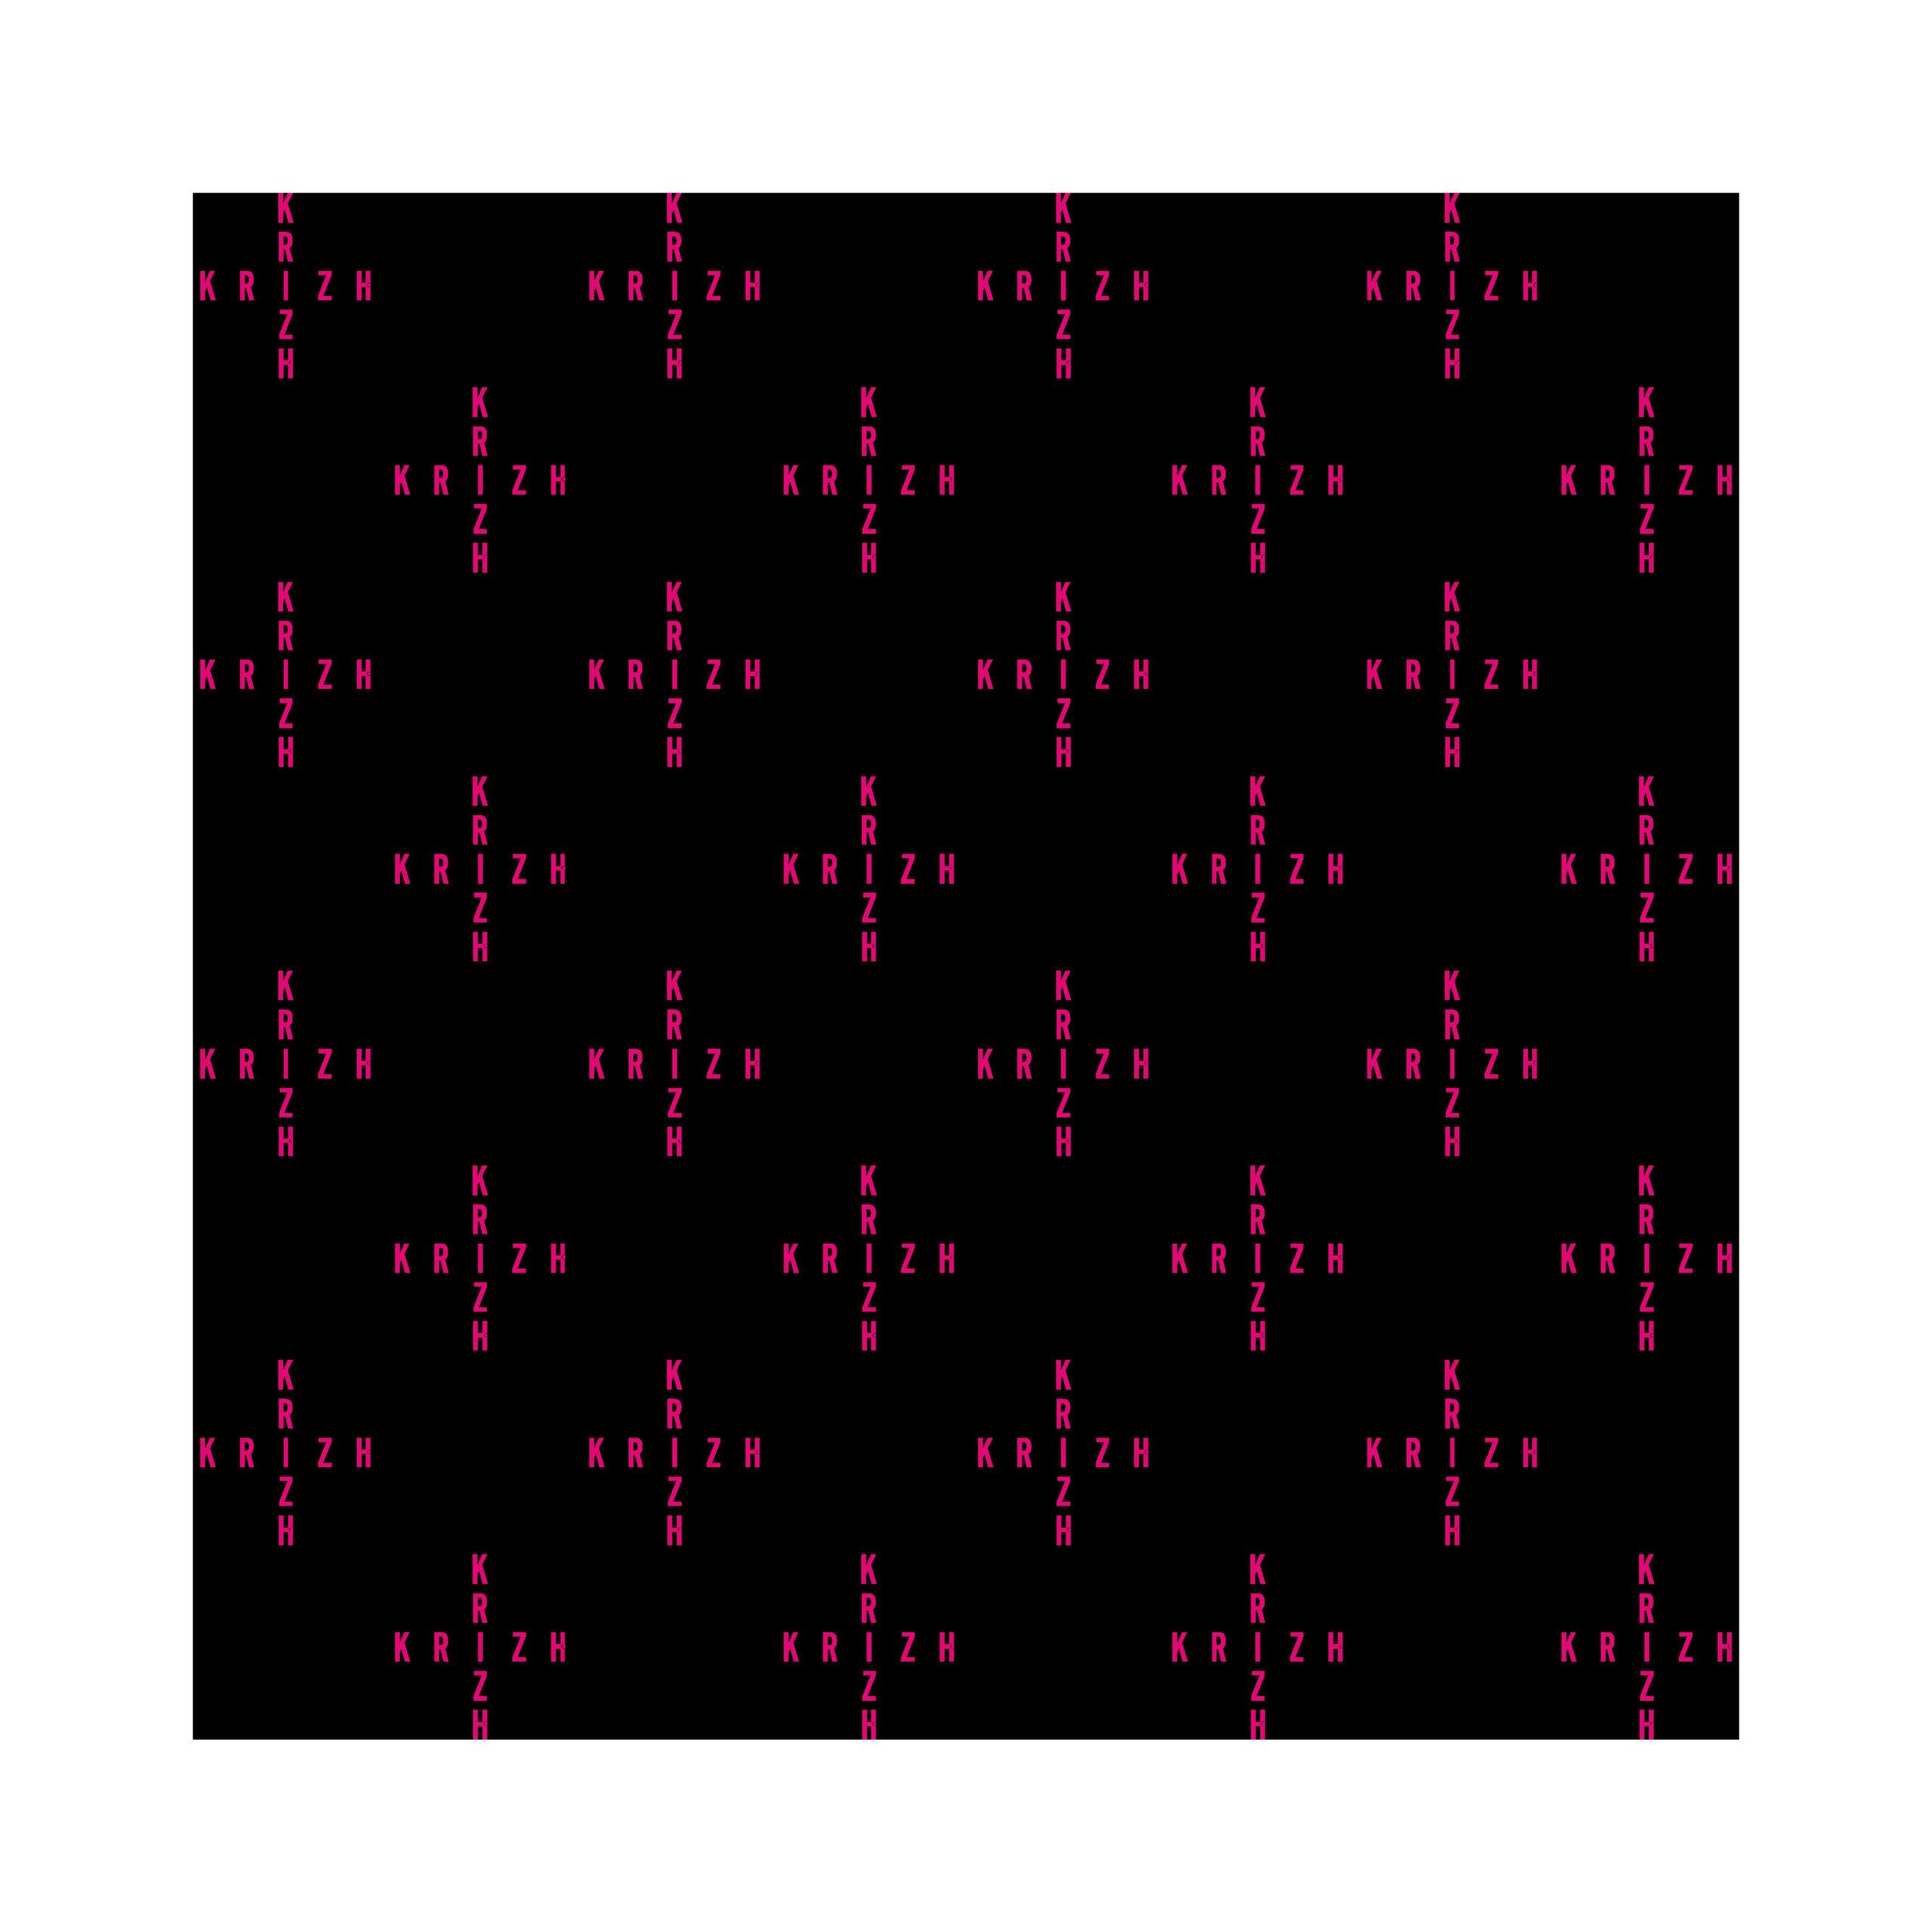 KRIZH Muster Kreuz (1)